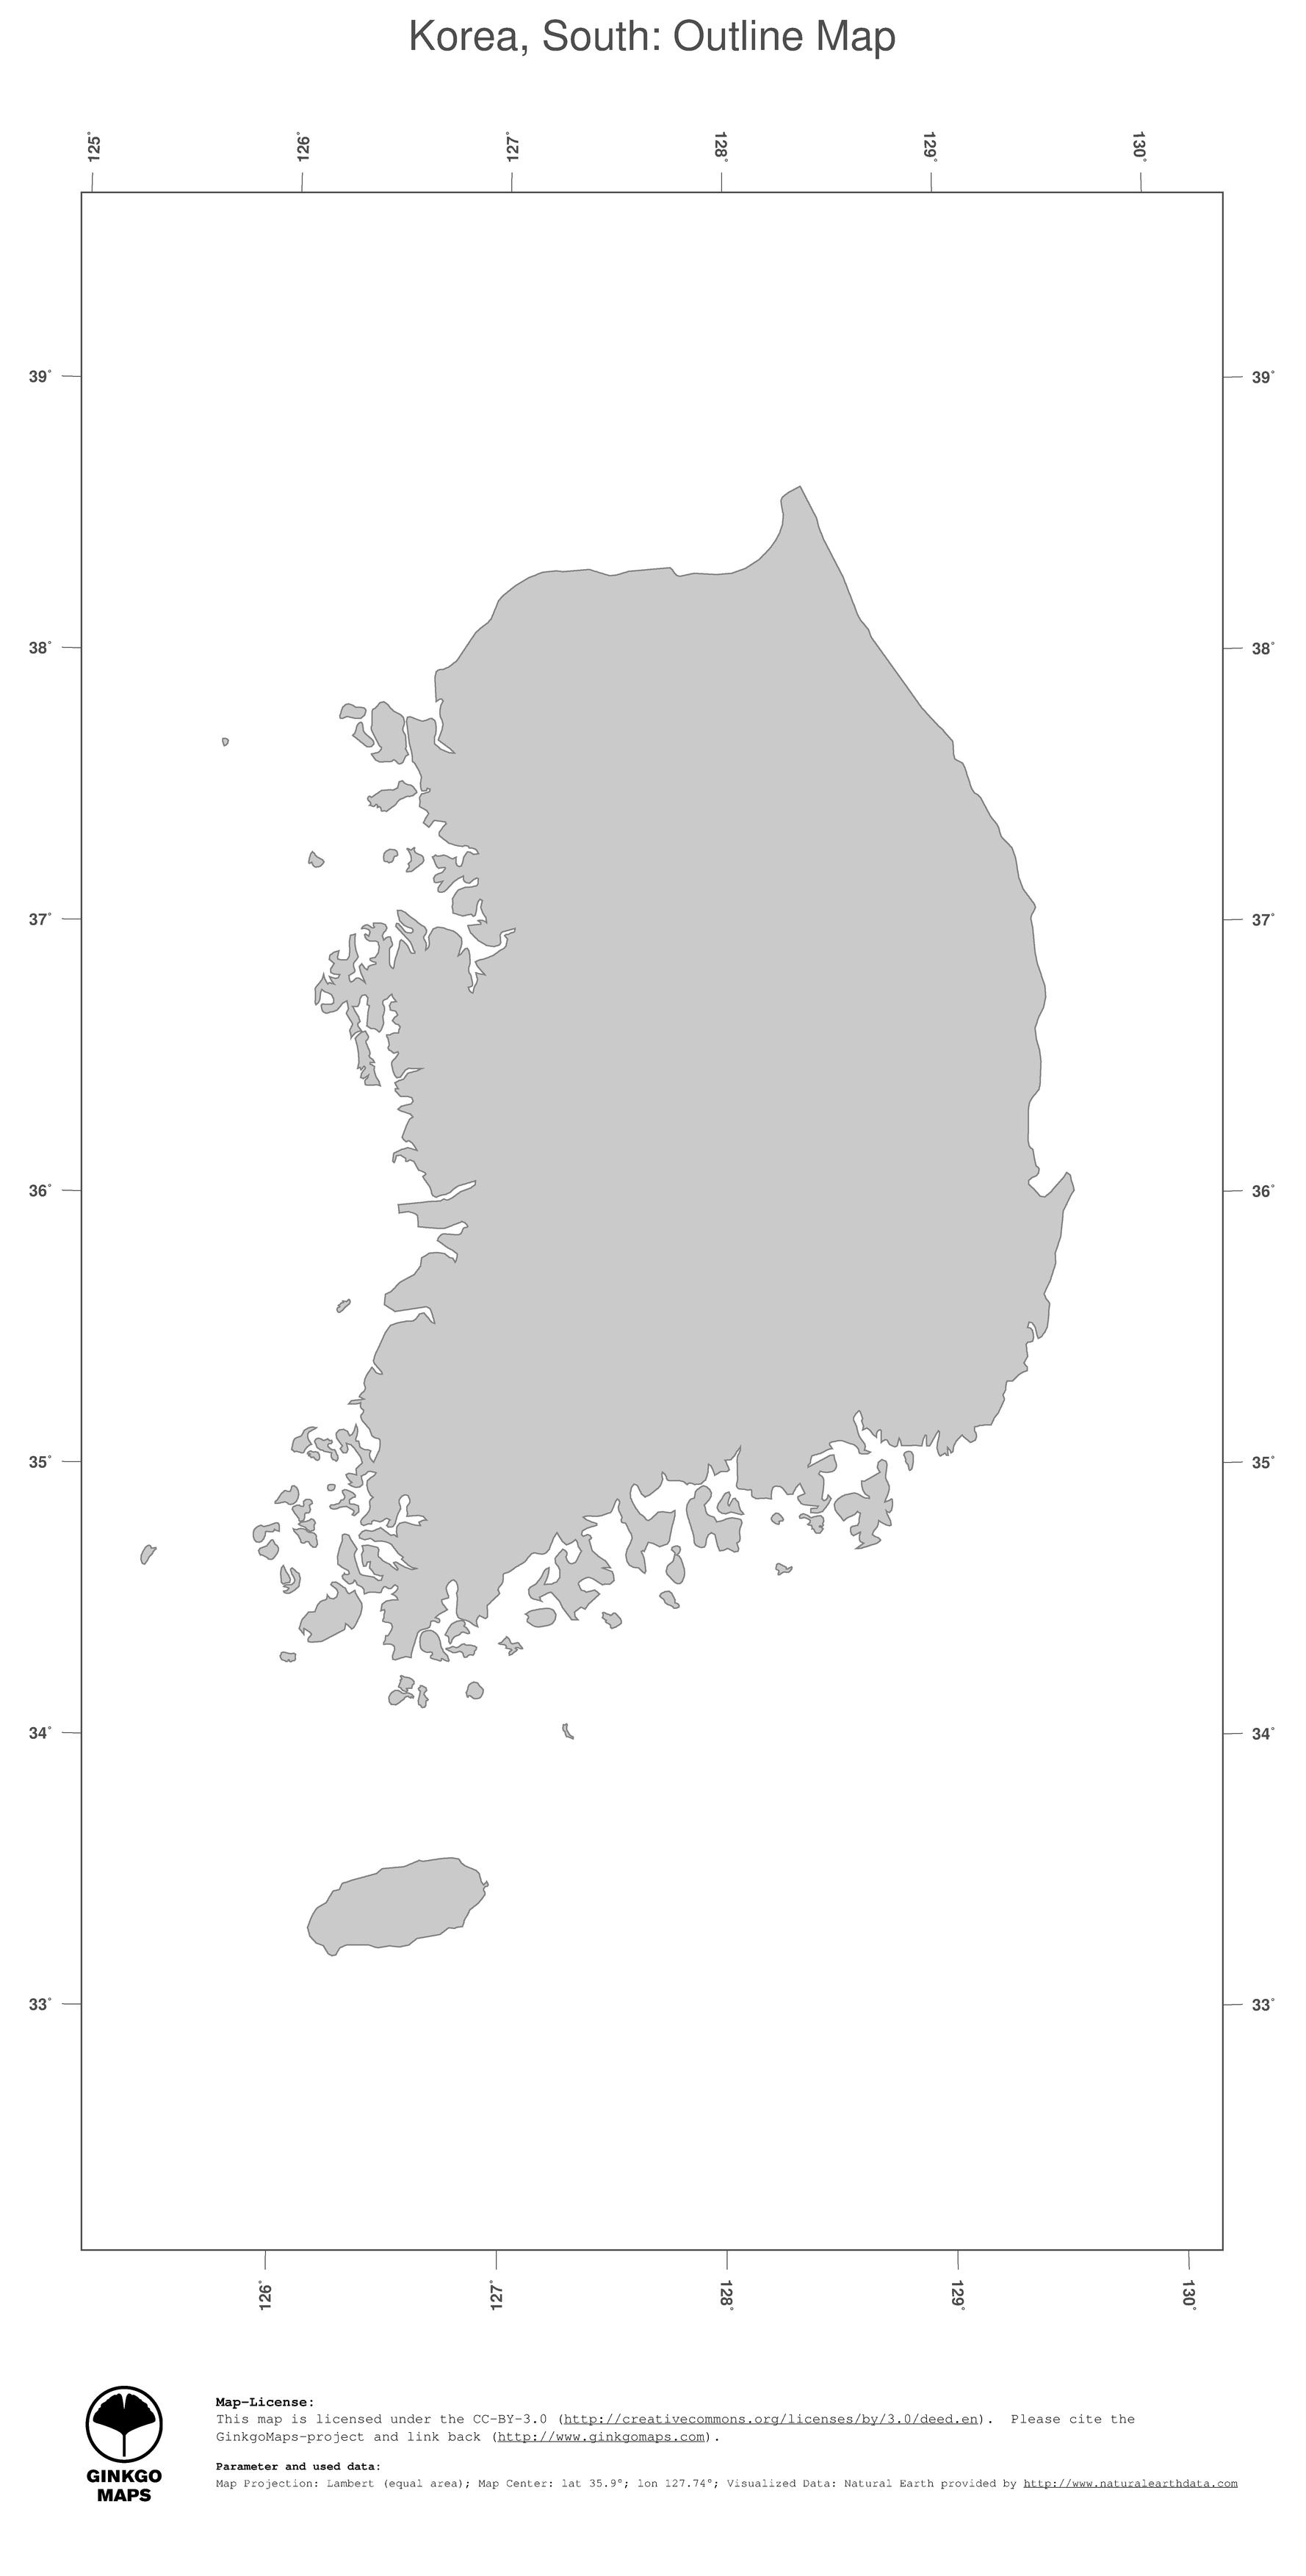 Map Korea South GinkgoMaps continent Asia region Korea South